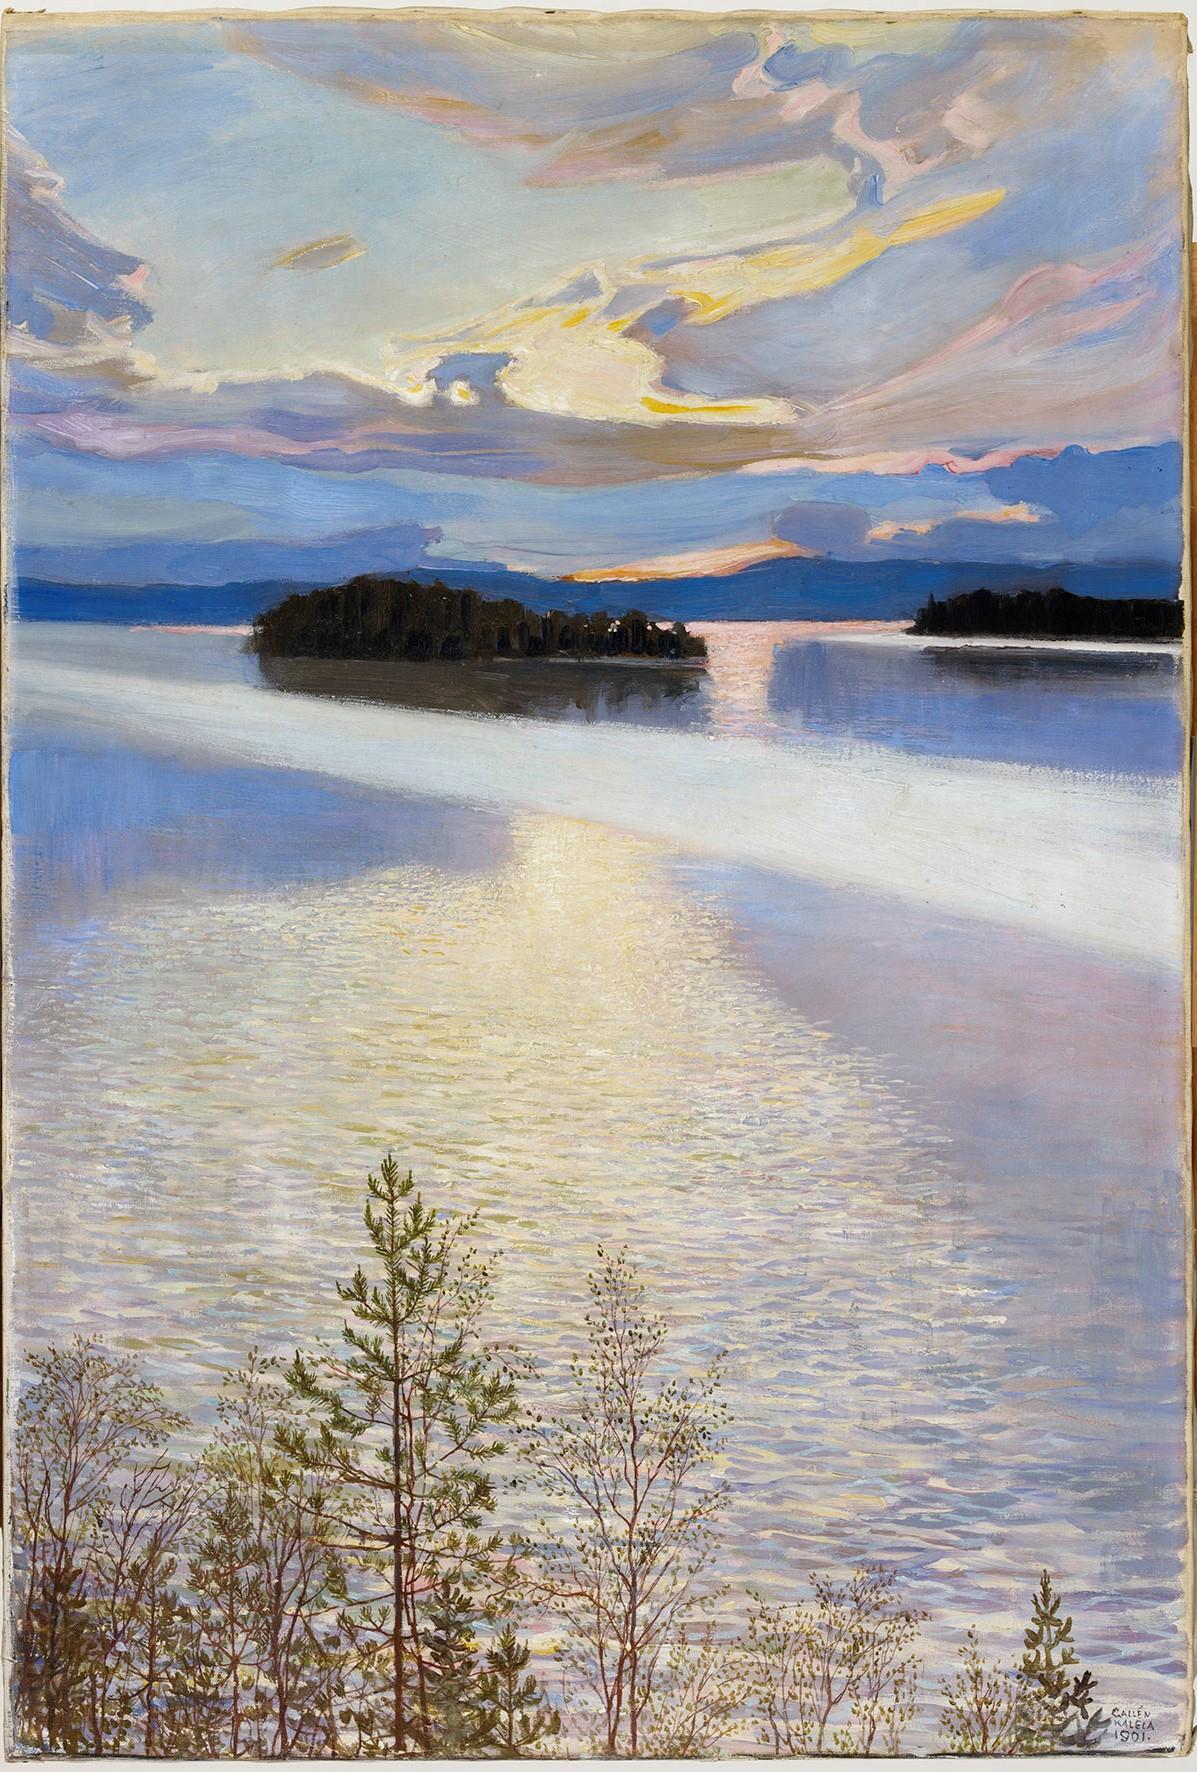 Lake Keitele X9611.pr.jpg